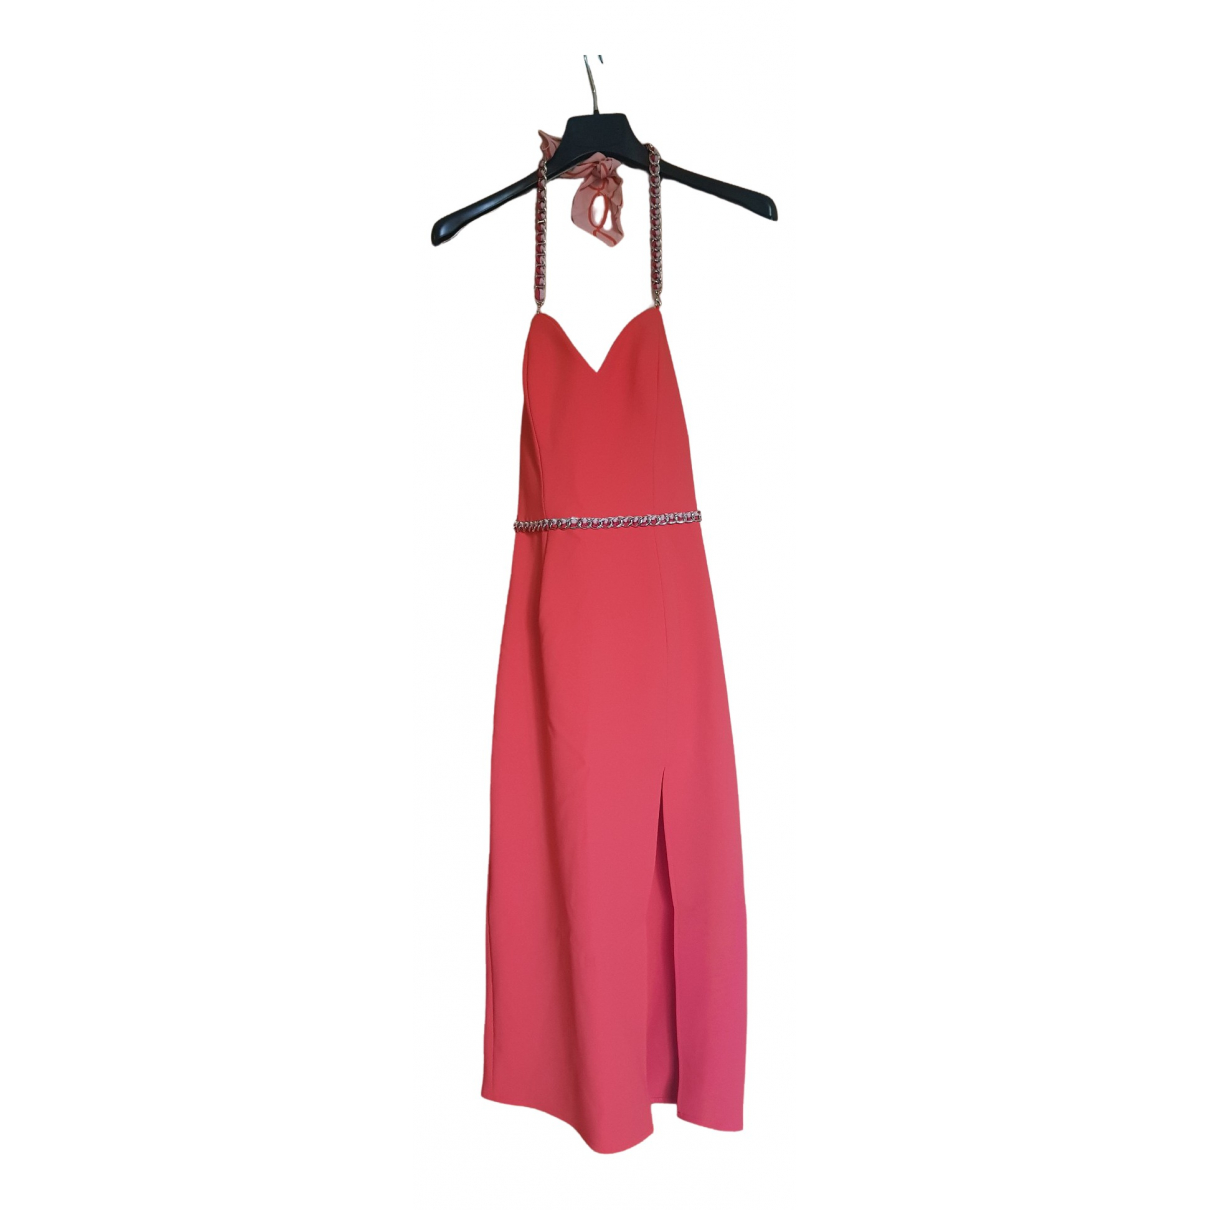 Elisabetta Franchi \N Kleid in  Rot Polyester